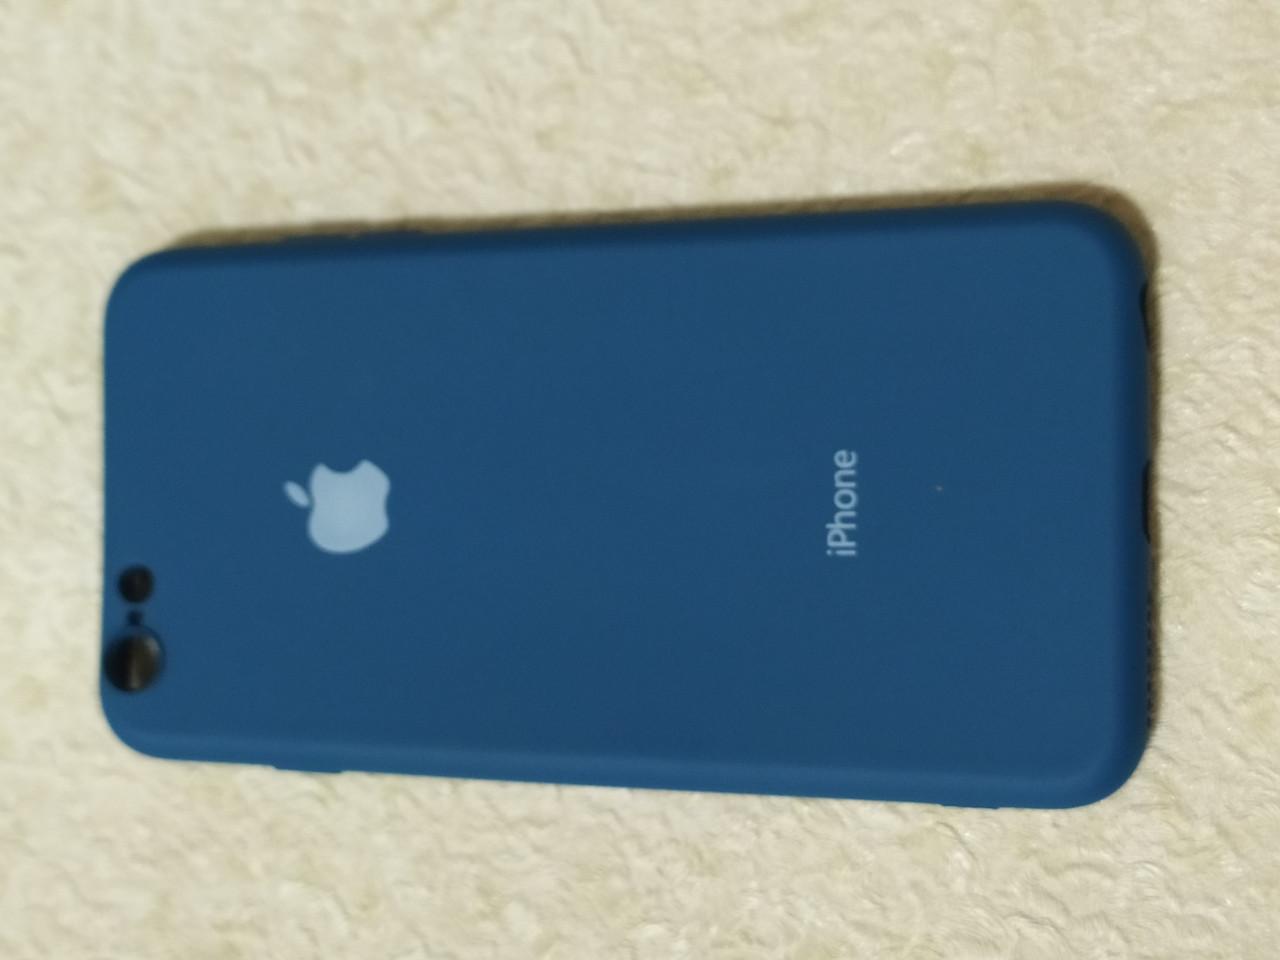 Накладка   Silicon Cover full   для    iPhone  6  Plus   (темно-синий) Copy